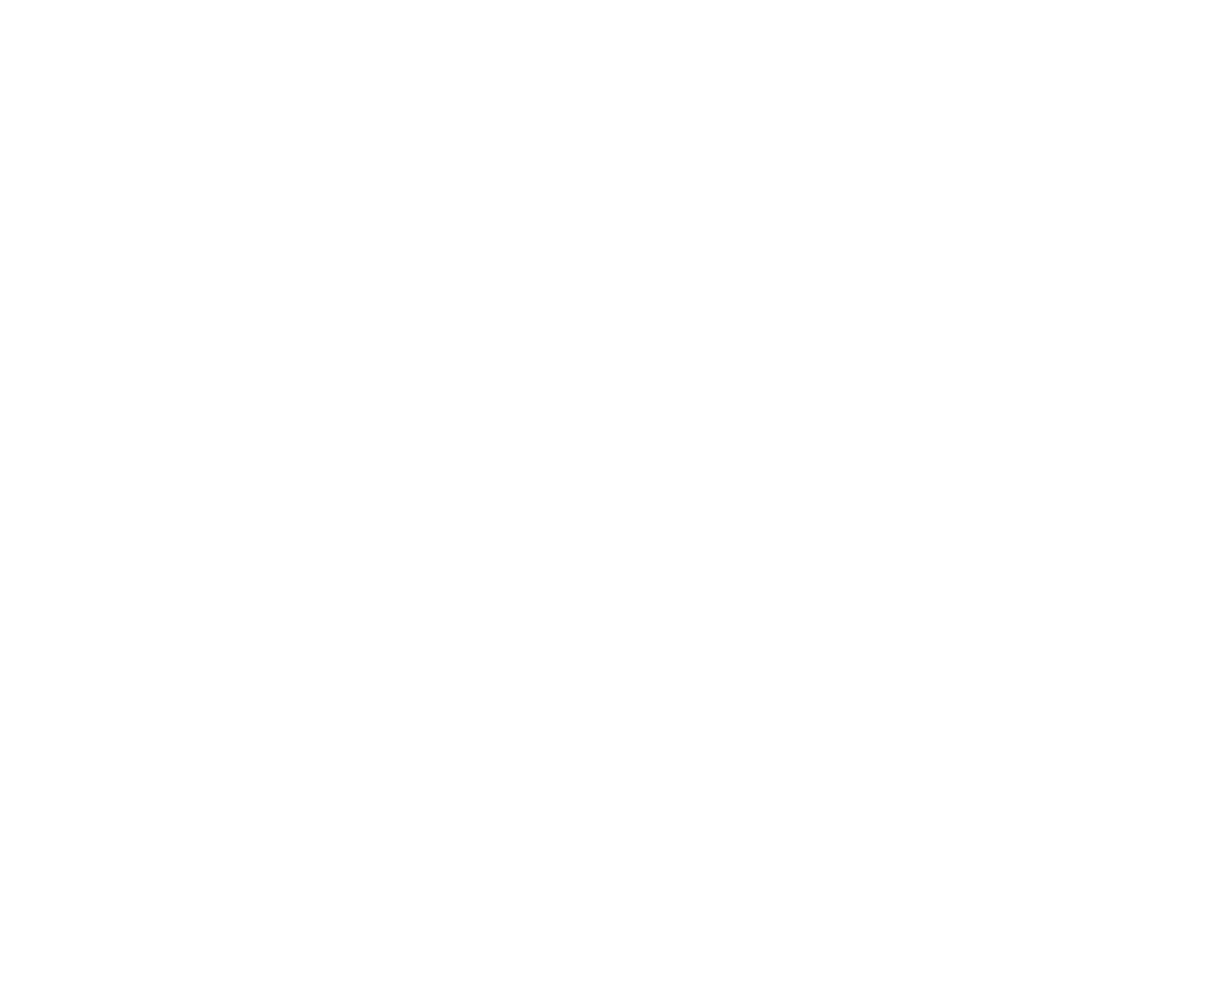 DON'T SLEEP ON THIS $500 BILLION BUSINESS